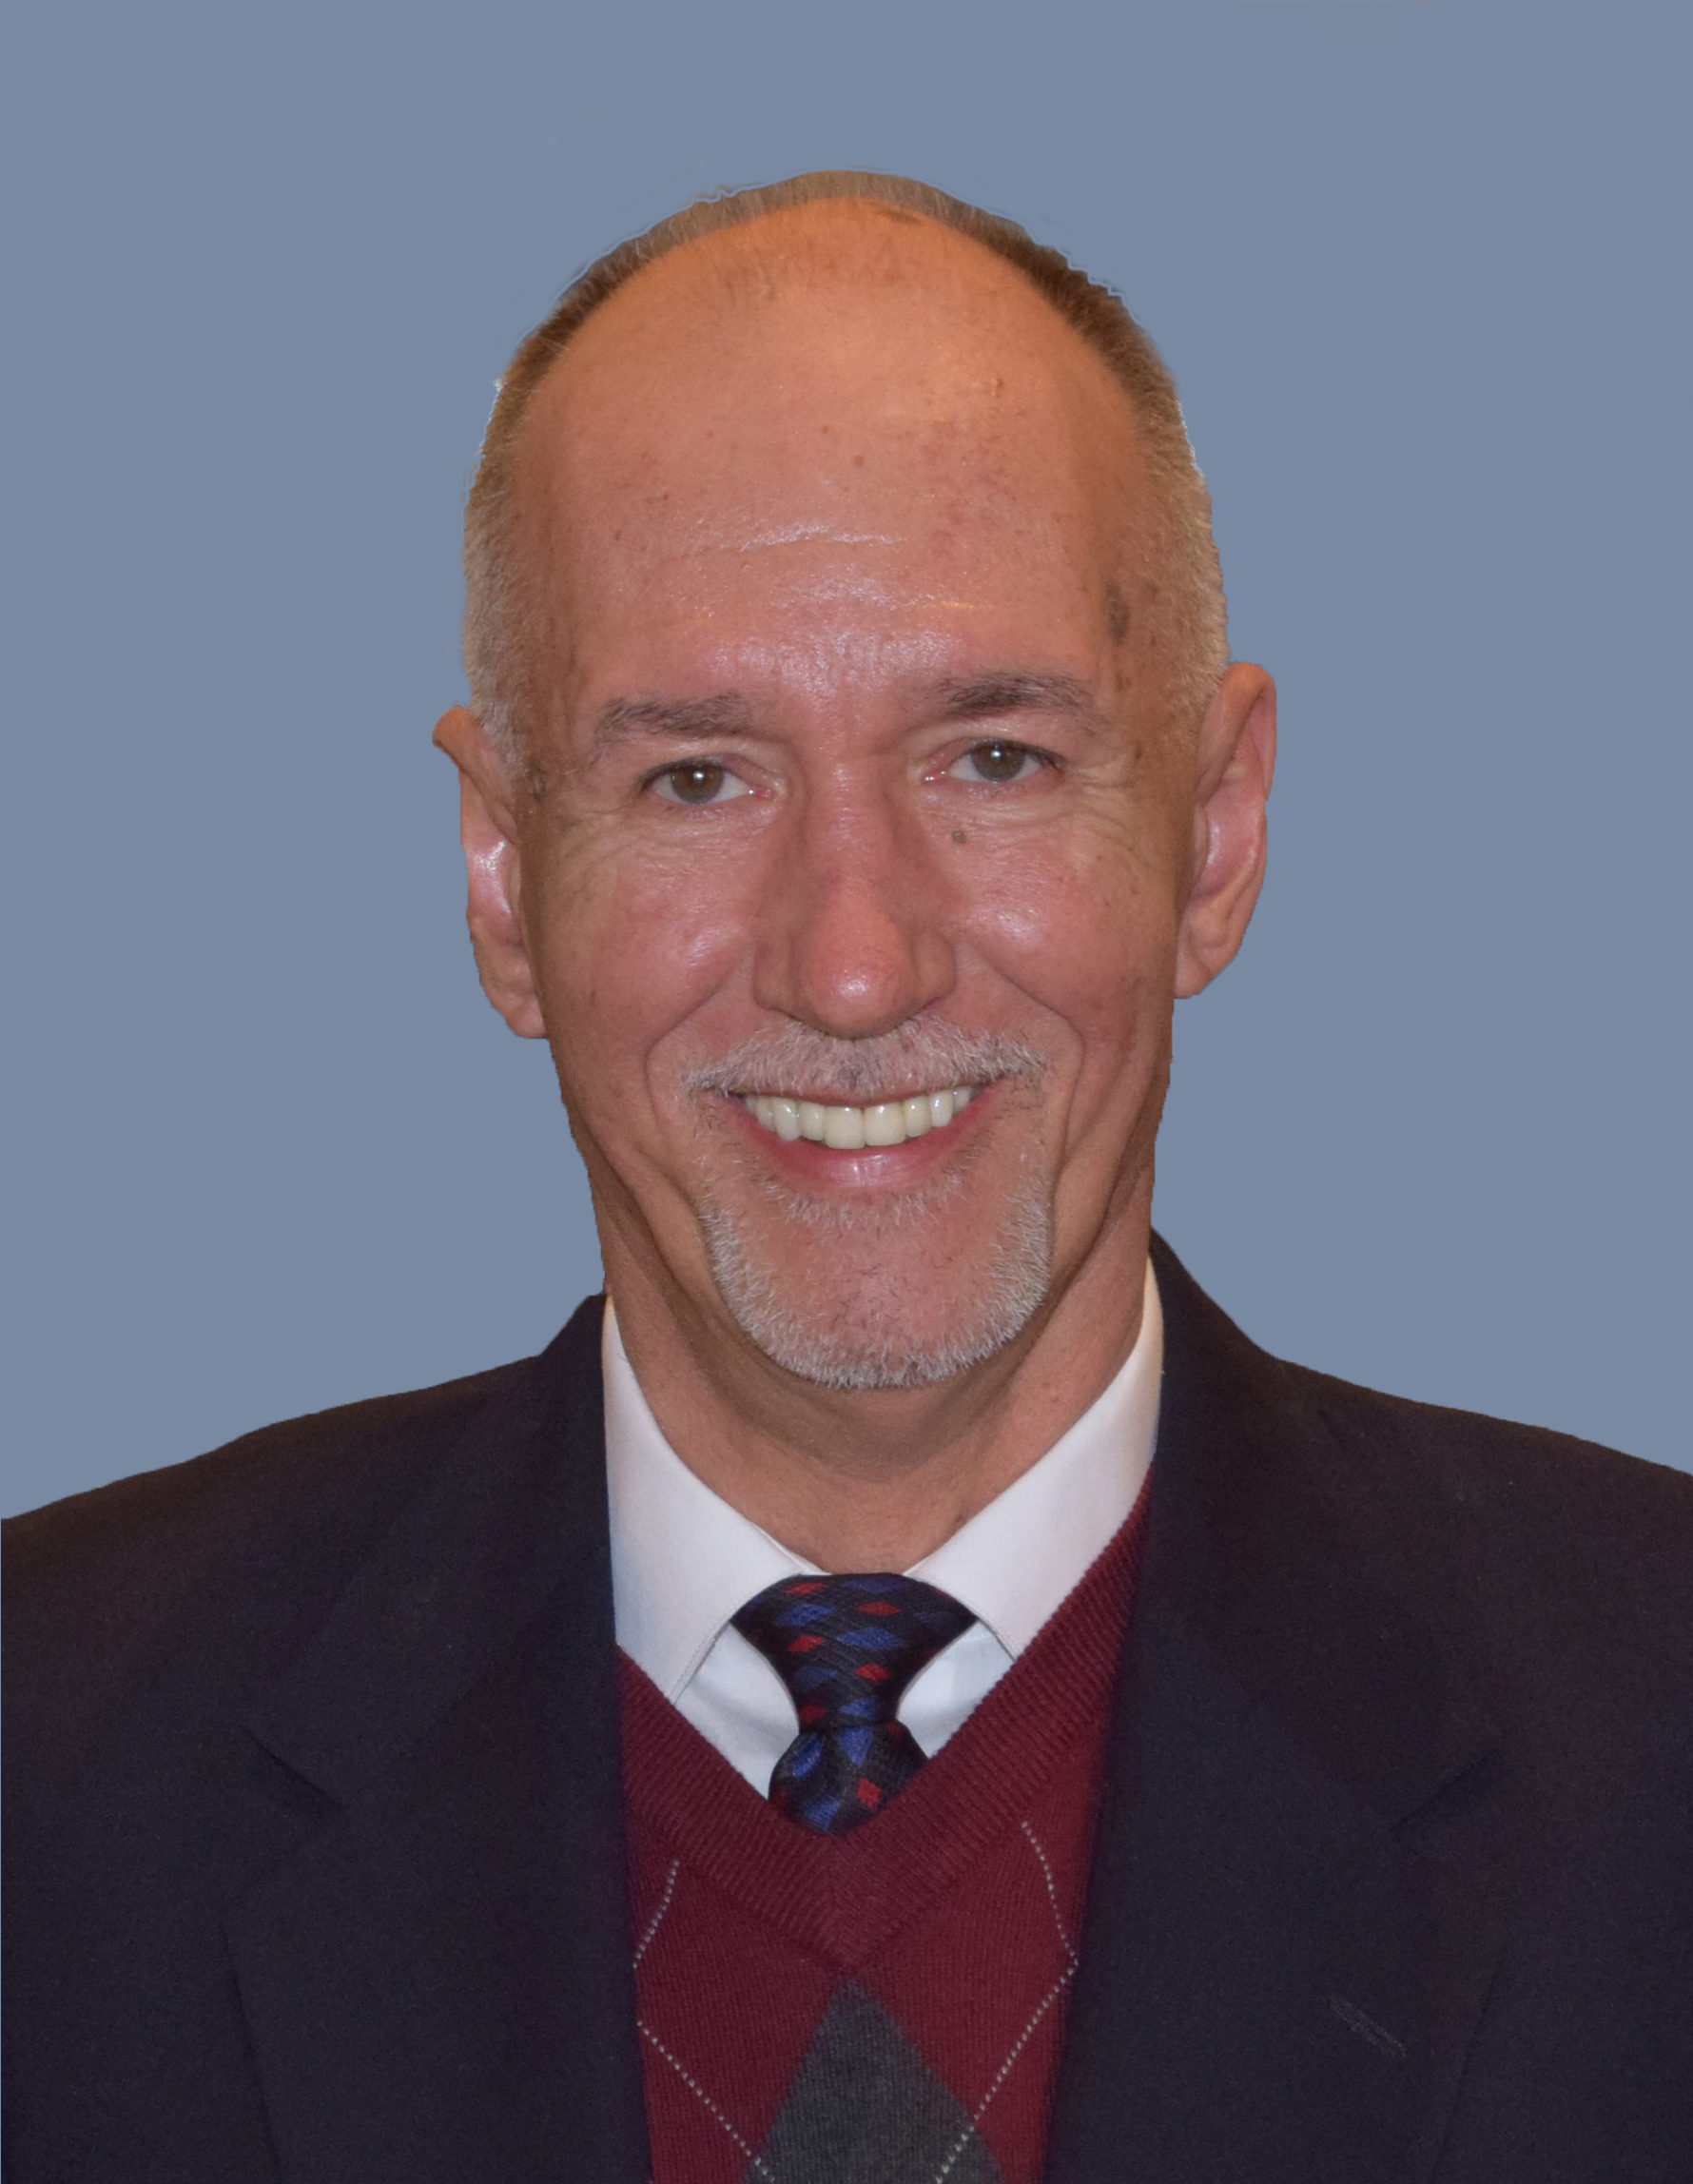 Daniel Fabbri